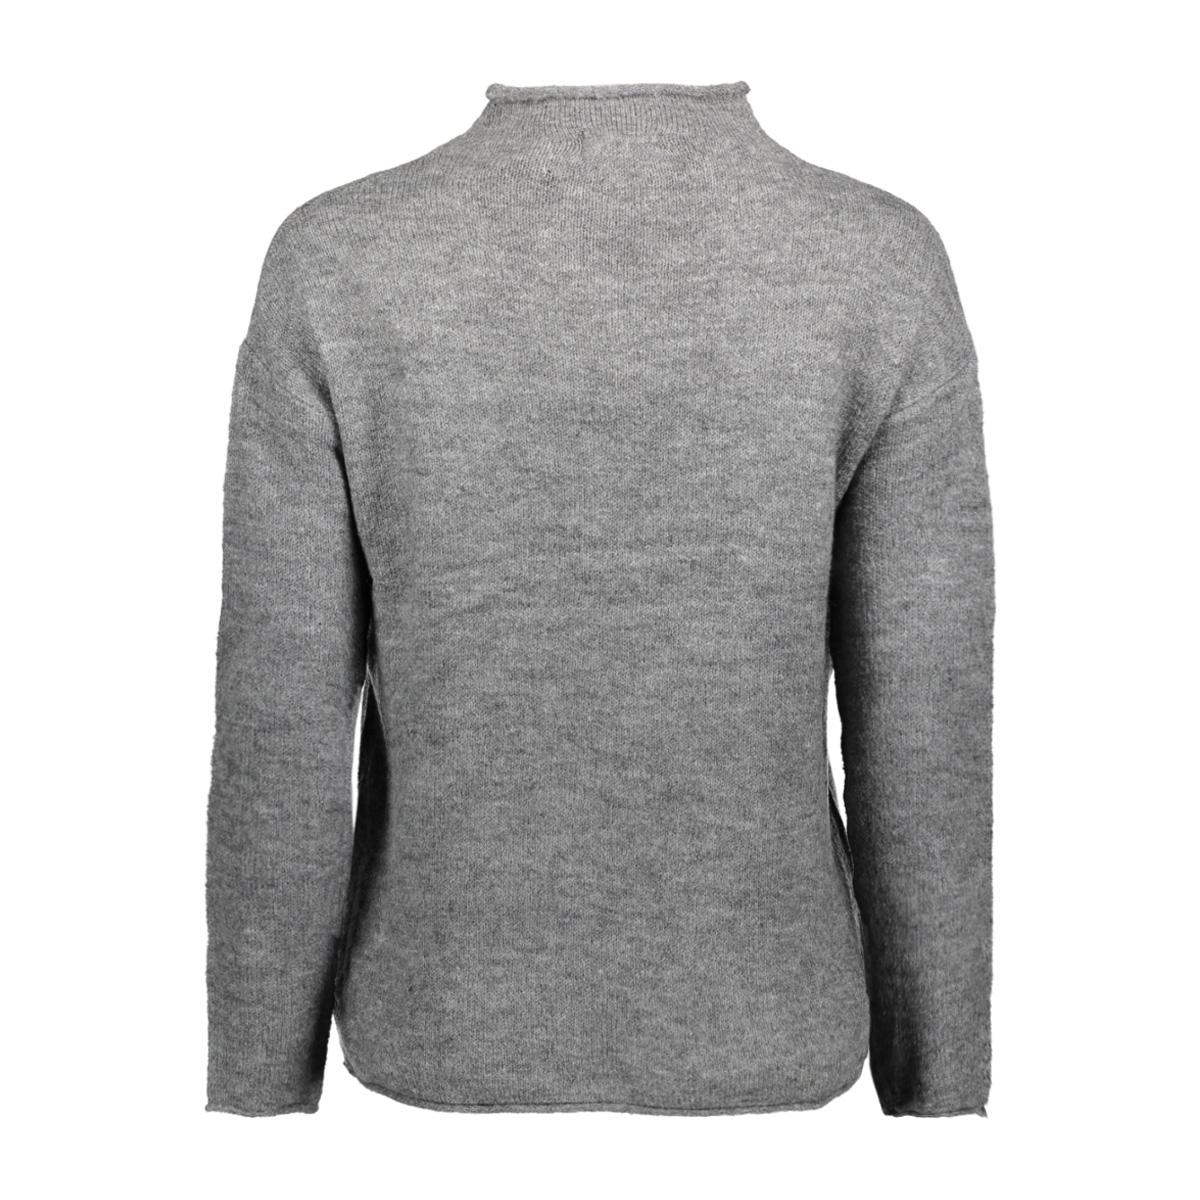 jdyalice l/s pullover knt 15137104 jacqueline de yong trui dark grey melange